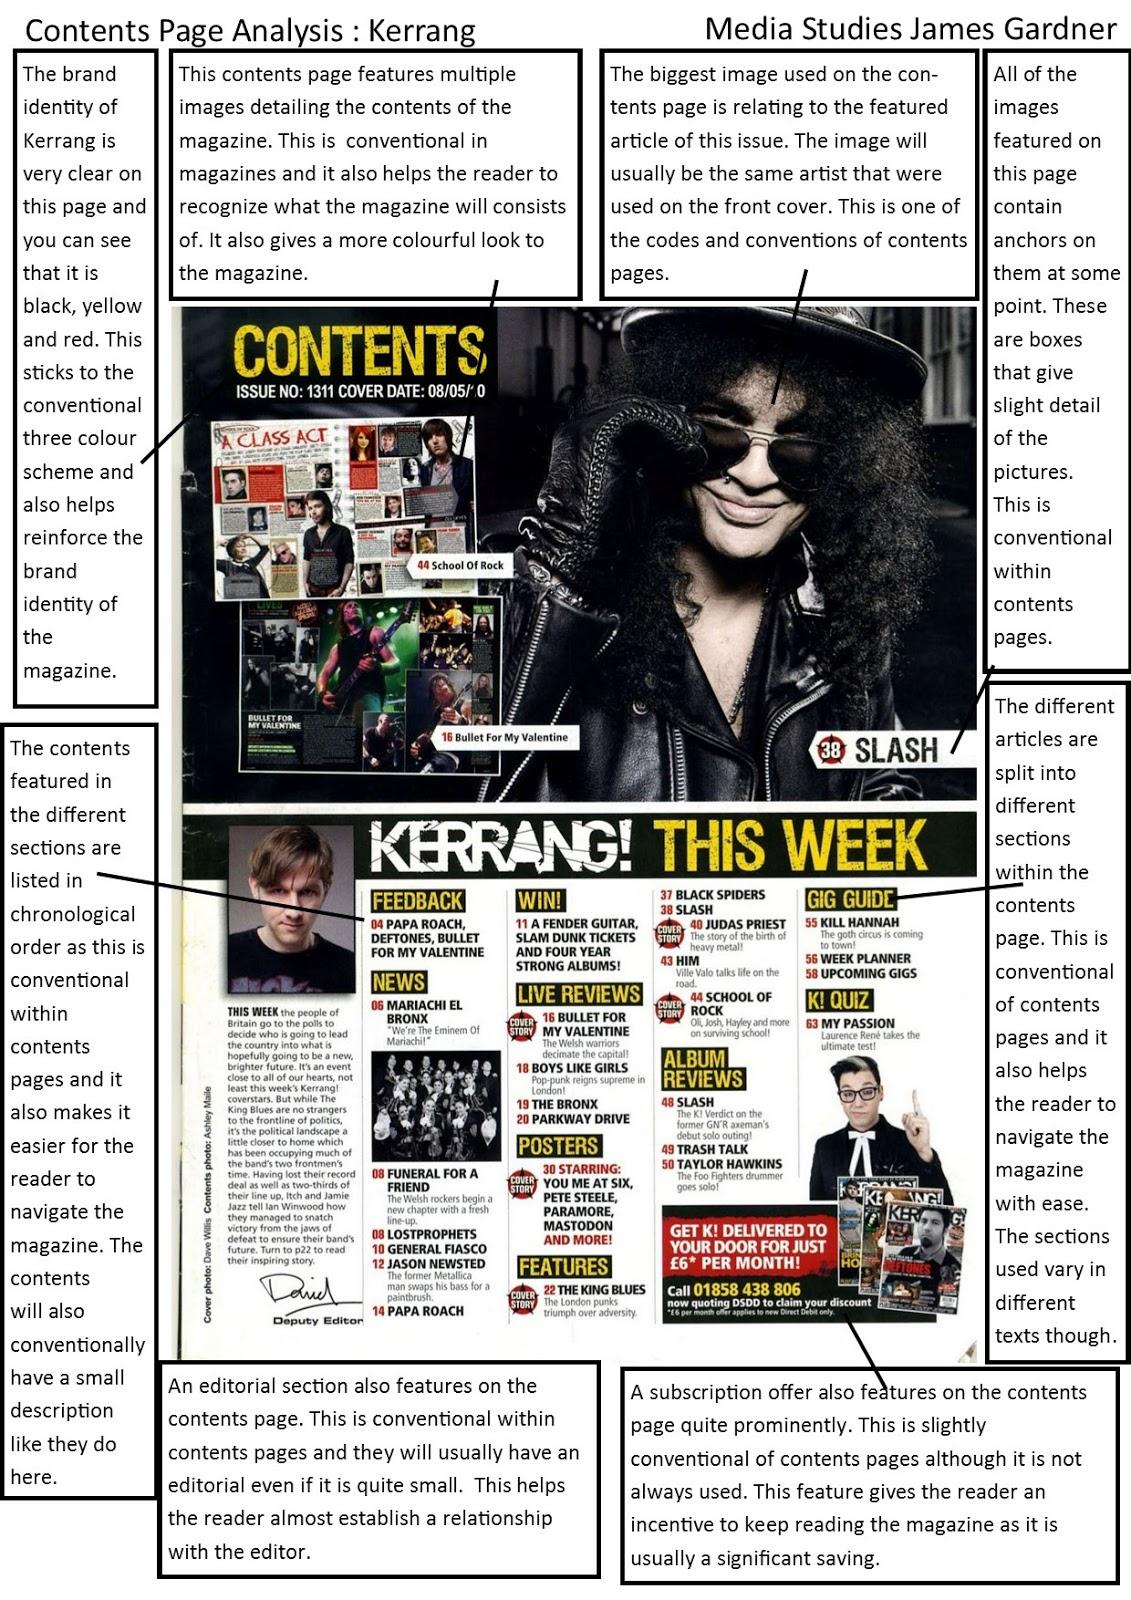 Kerrang magazine analysis essay